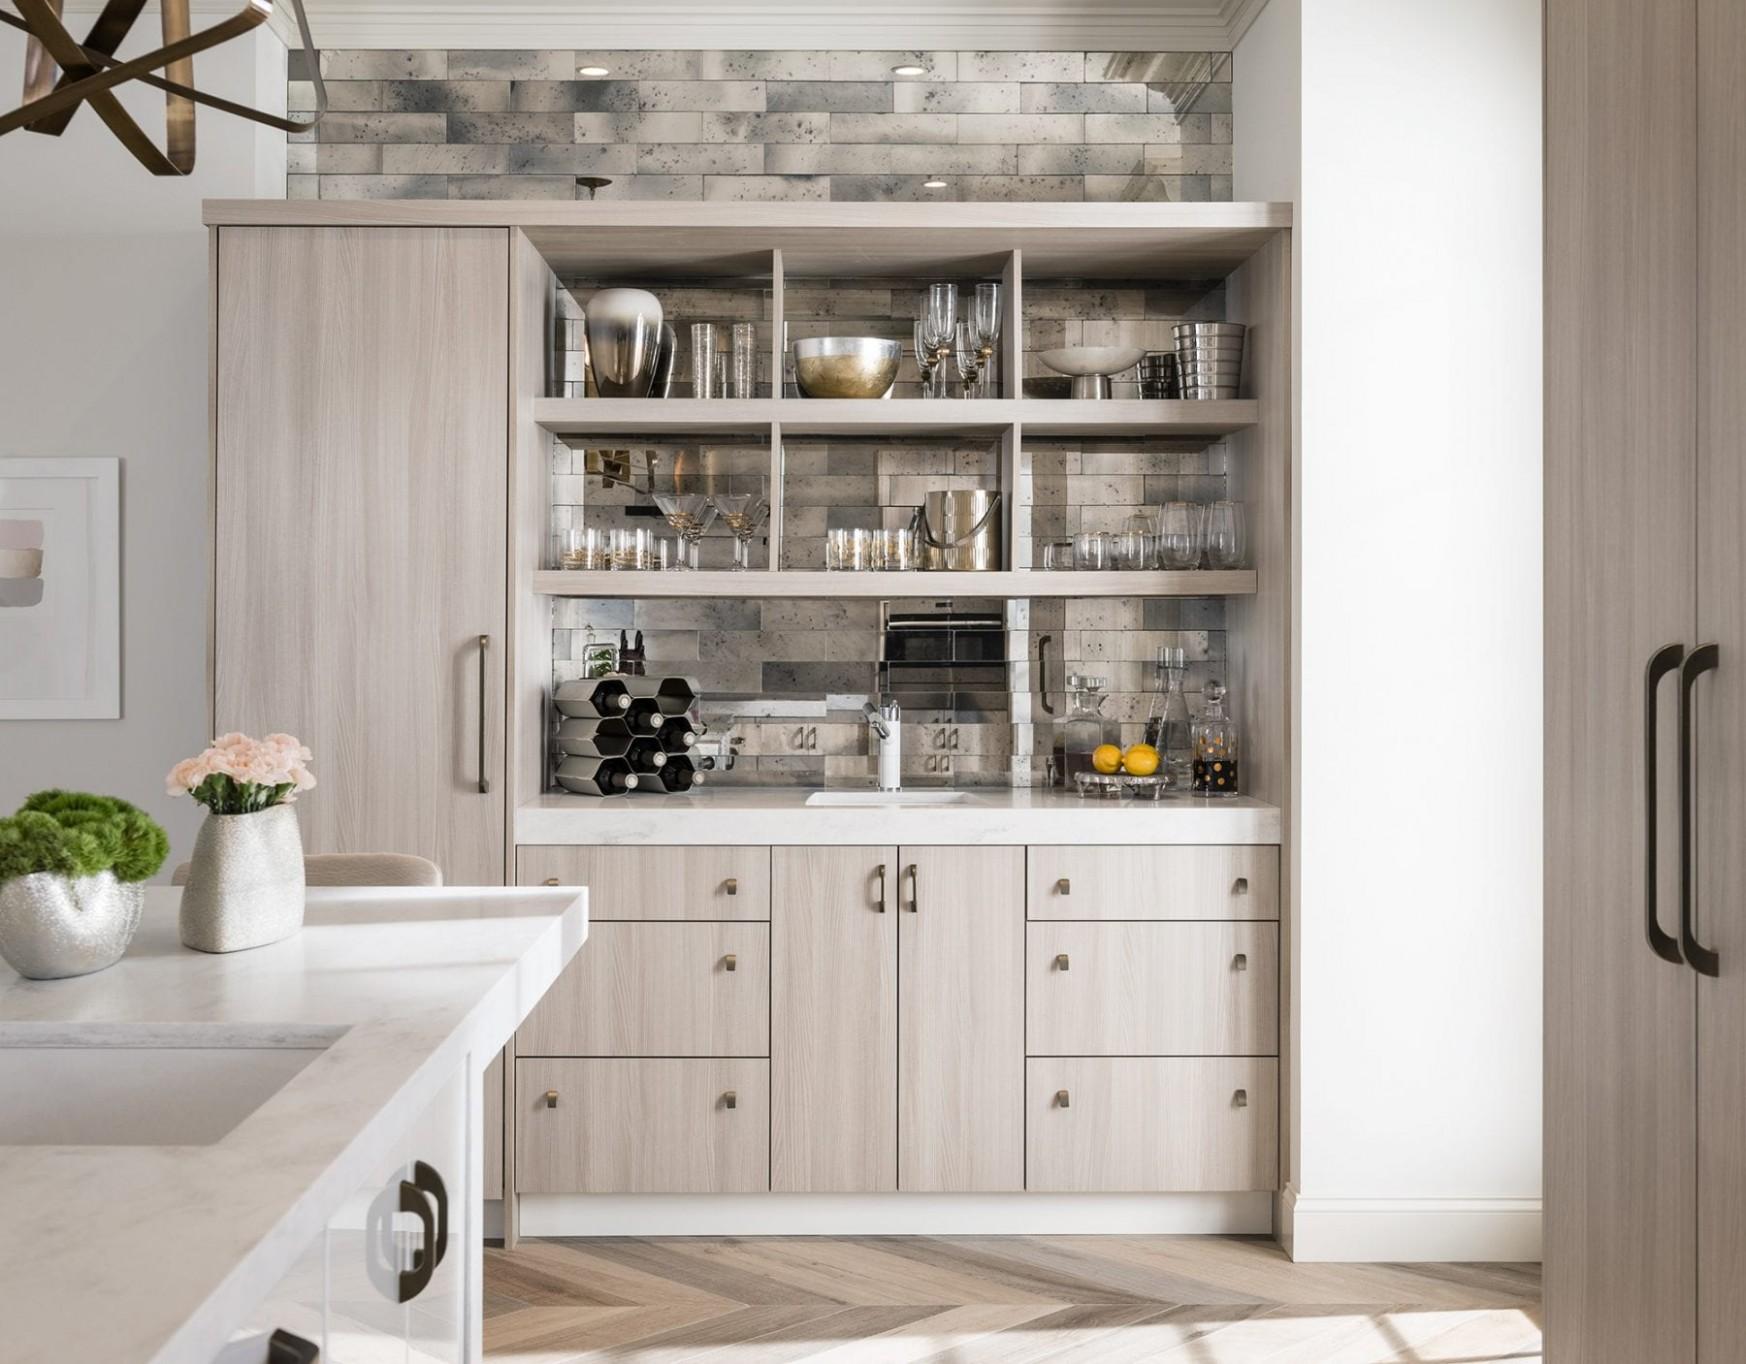 UltraCraft Cabinets Parker, CO  Custom Kitchen & Bath Cabinetry - Kitchen Cabinets Parker Co